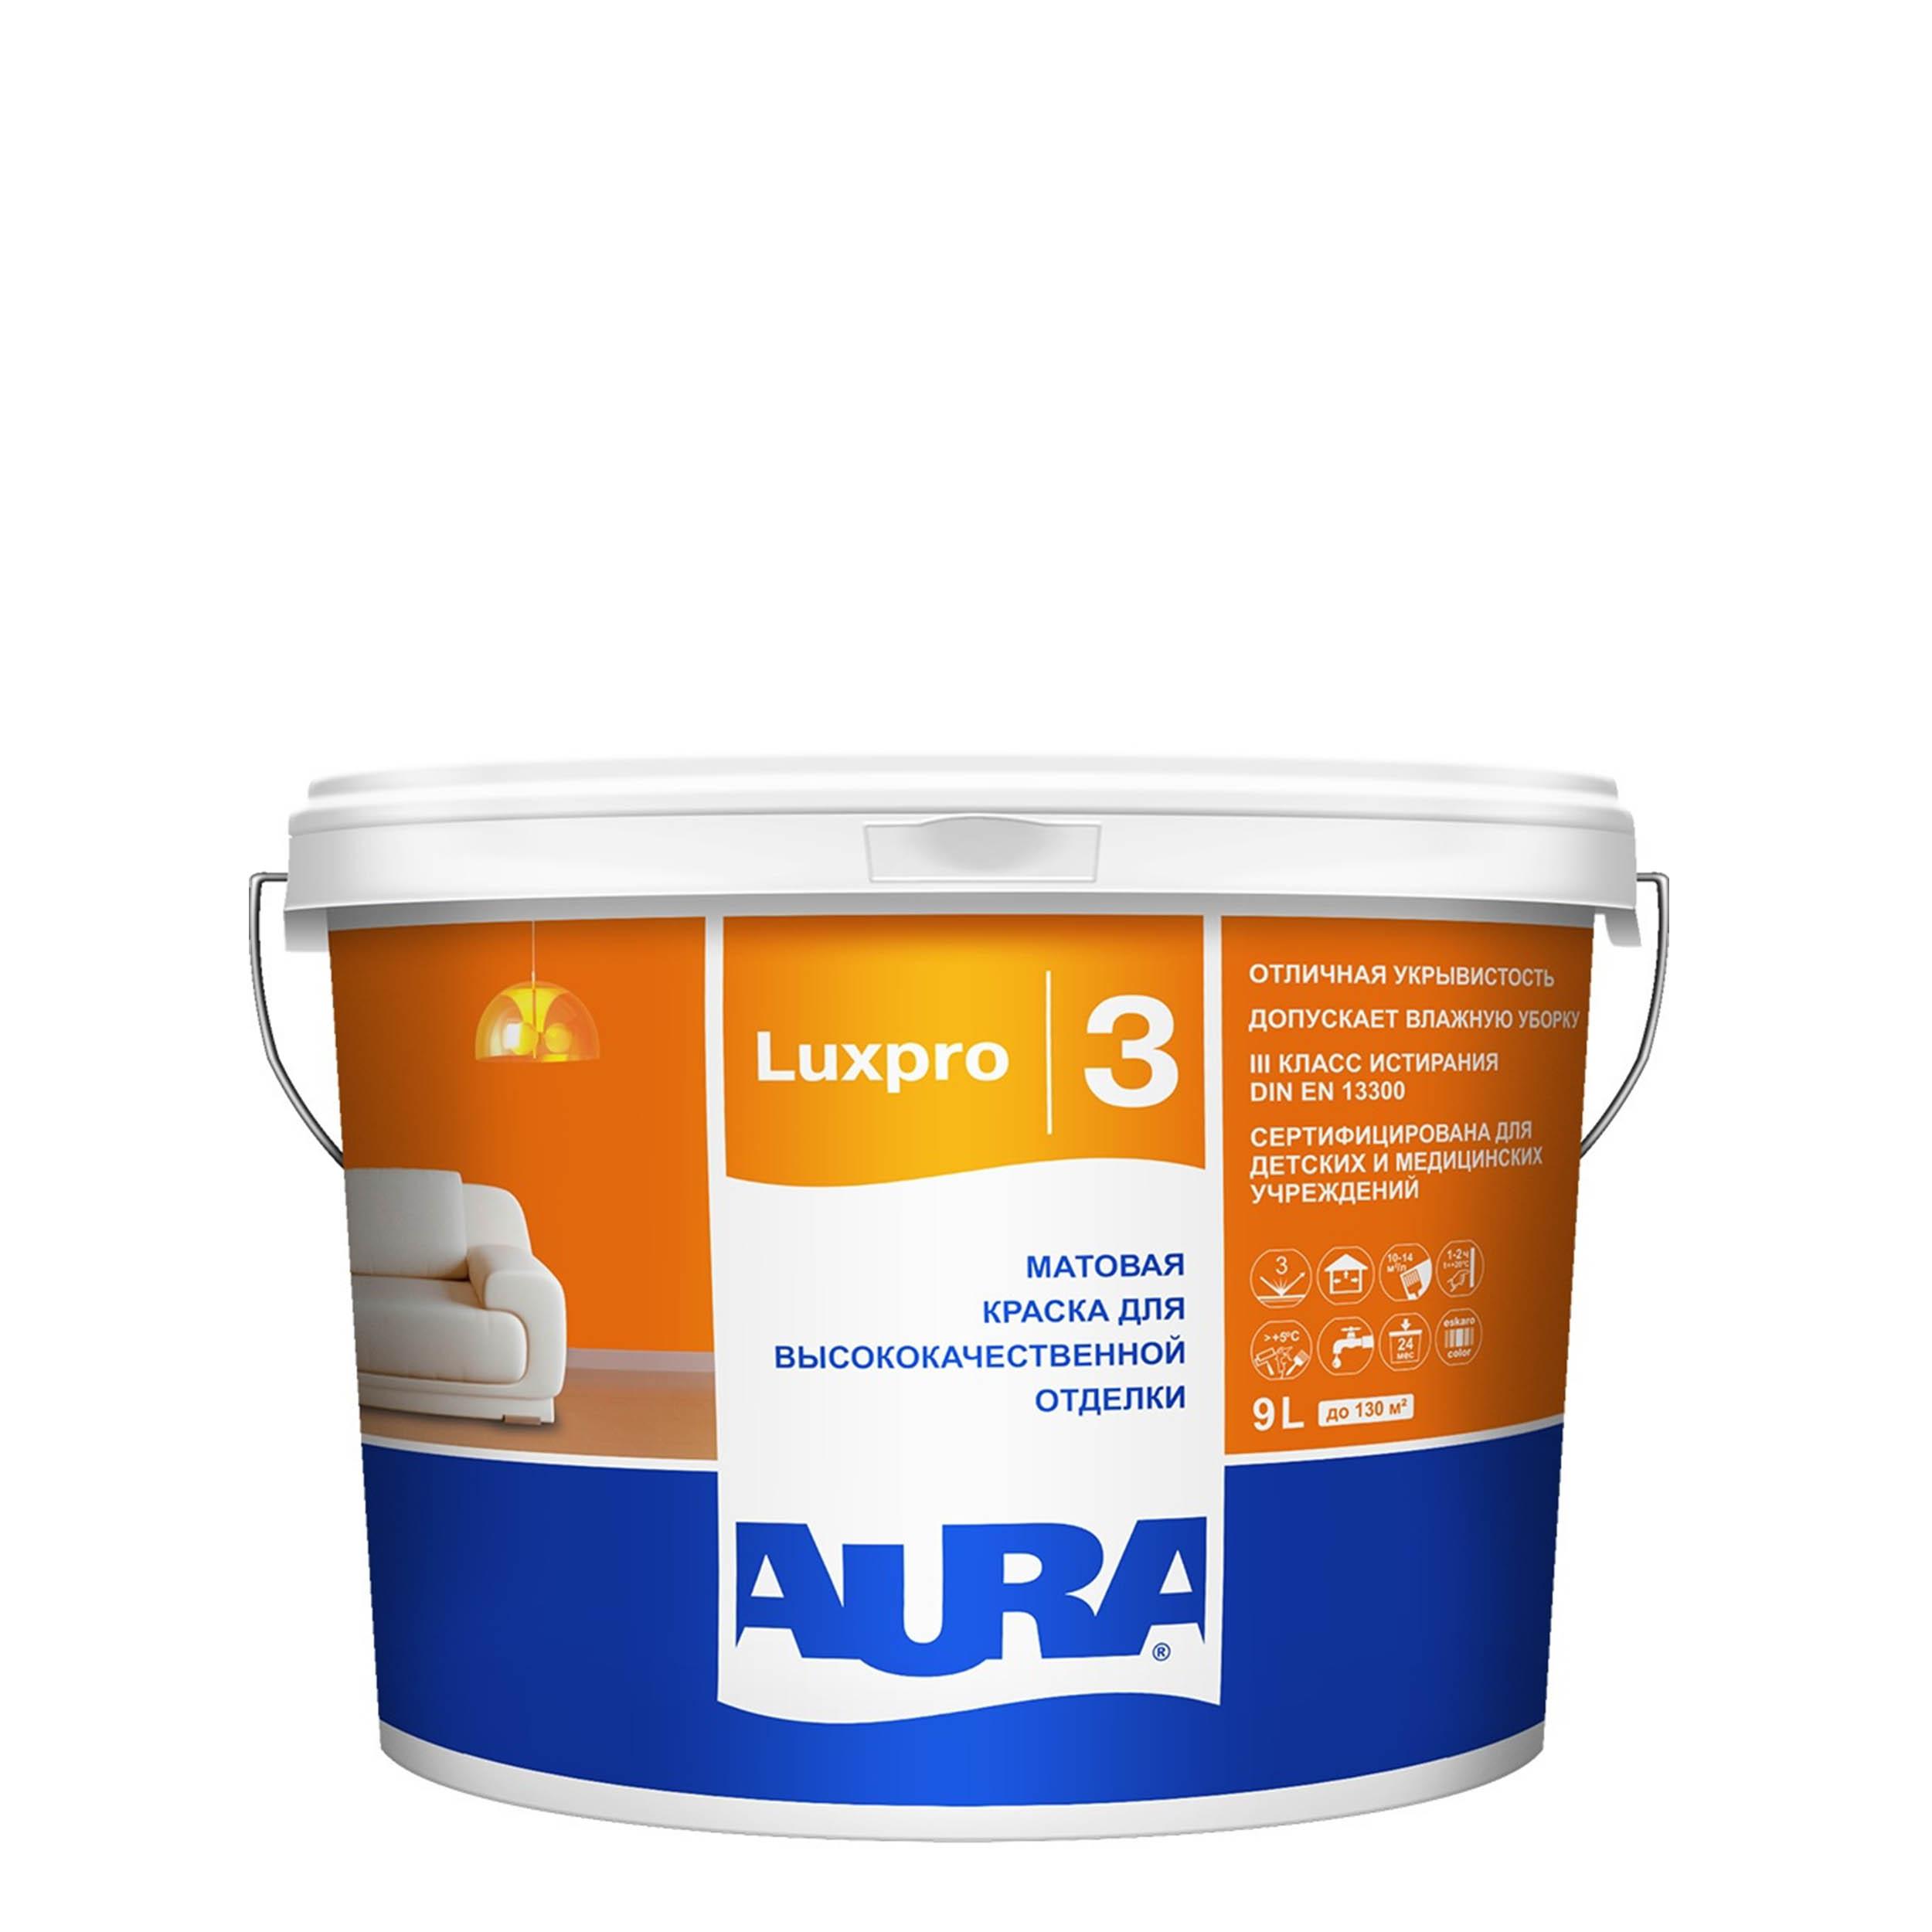 Фото 3 - Краска интерьерная, Aura LuxPRO 3, RAL 1034, 11 кг.